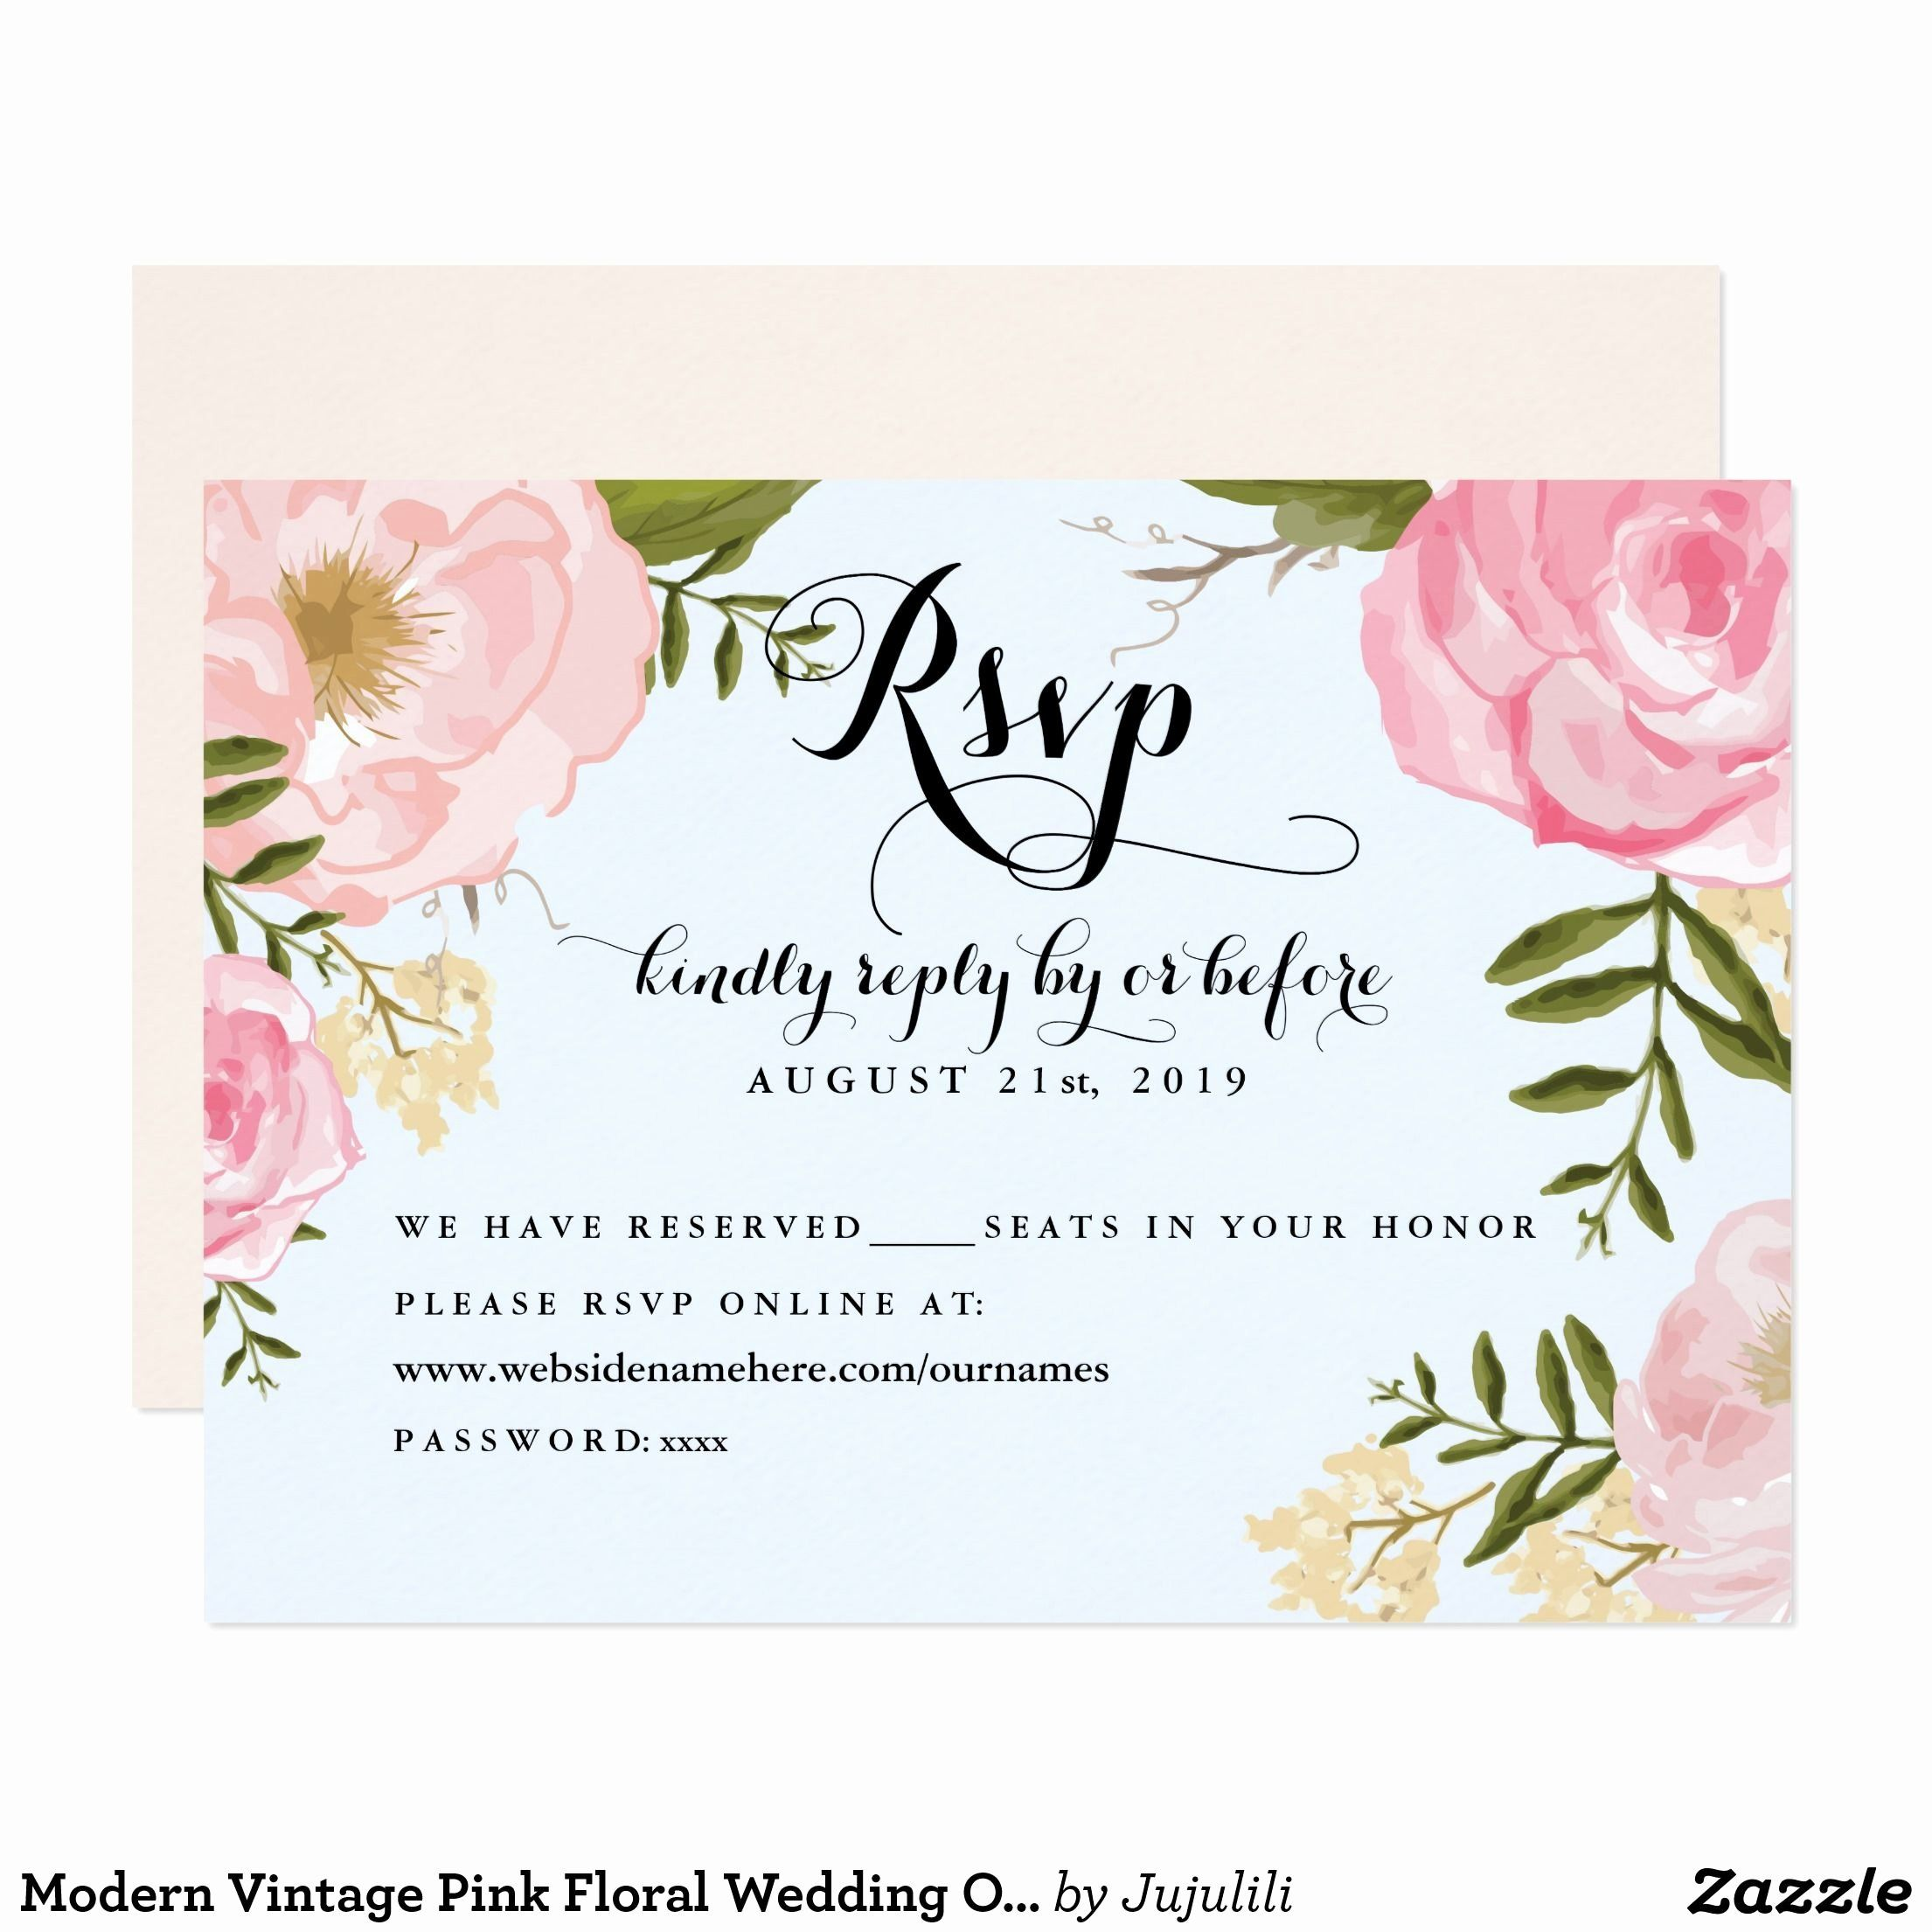 Wedding Invitation Rsvp Online Wording Beautiful Modern